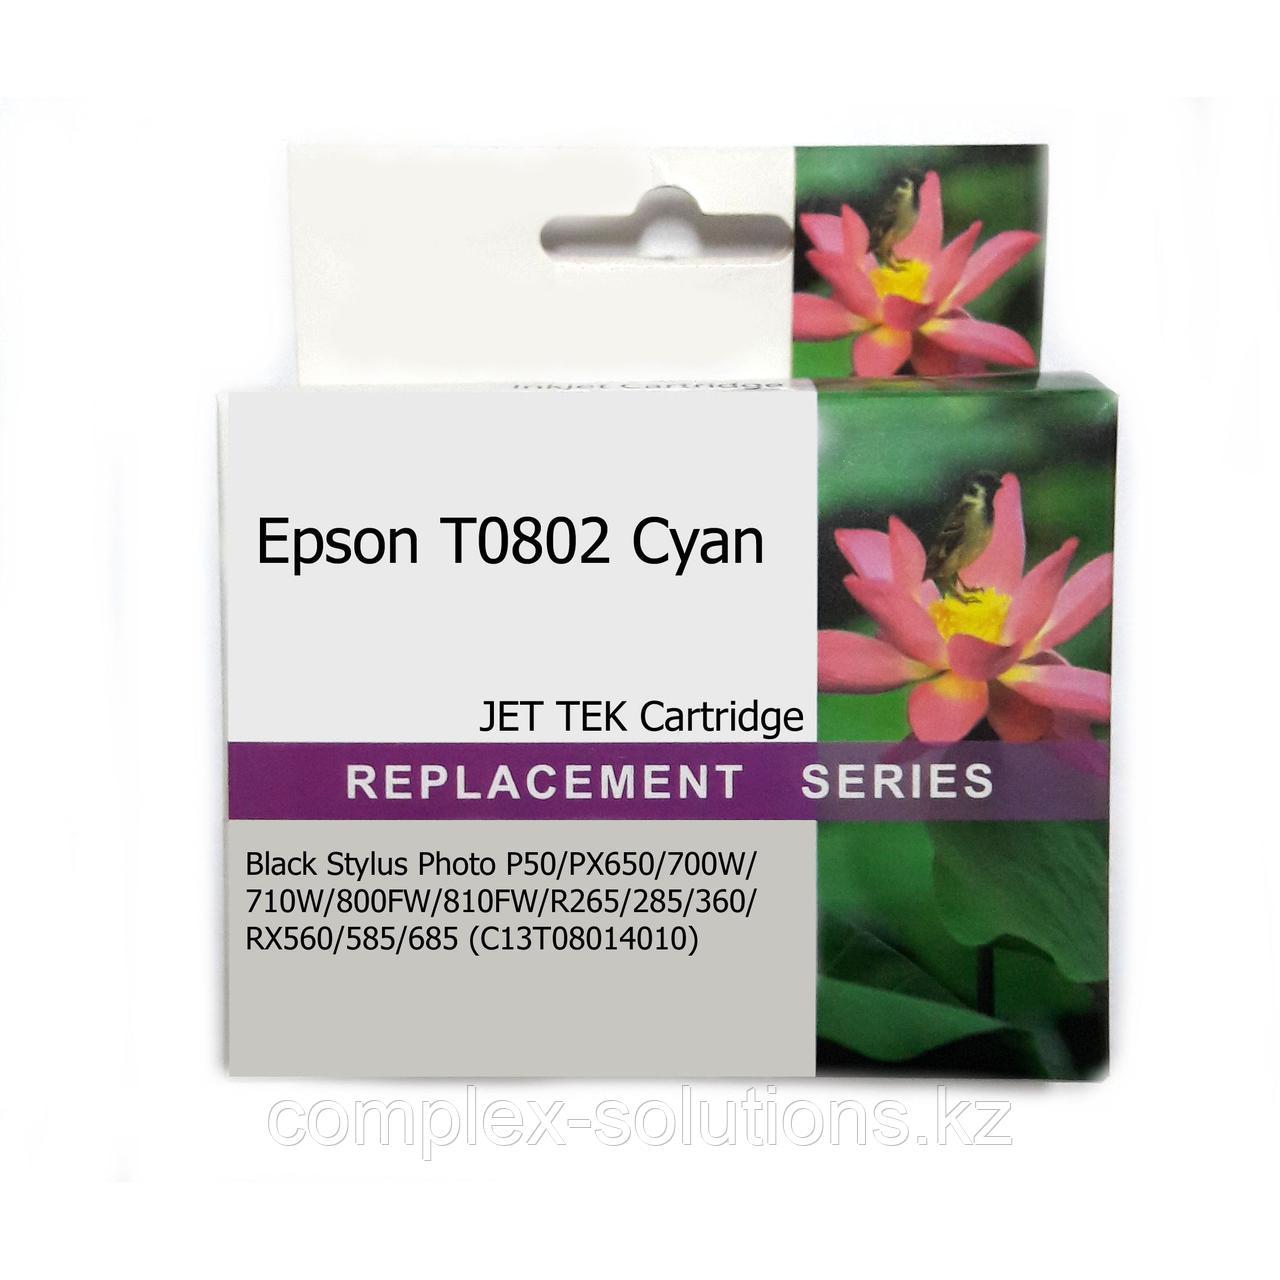 Картридж EPSON T0802 Cyan JET TEK | [качественный дубликат]